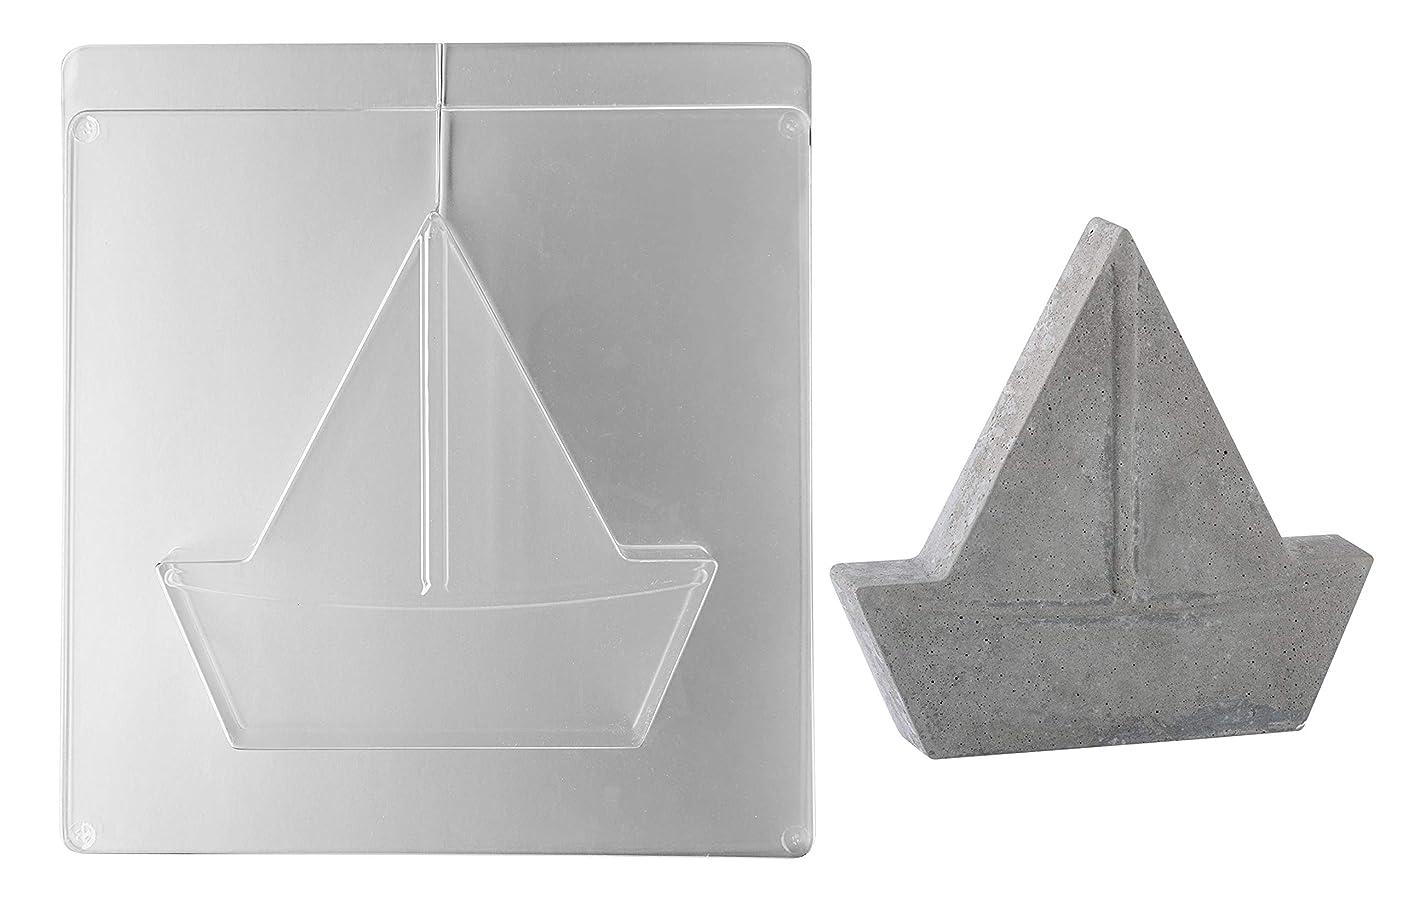 Rayher Casting Mould, Polyethylene Terephthalate, 35 x 10.5 x 3.3 cm